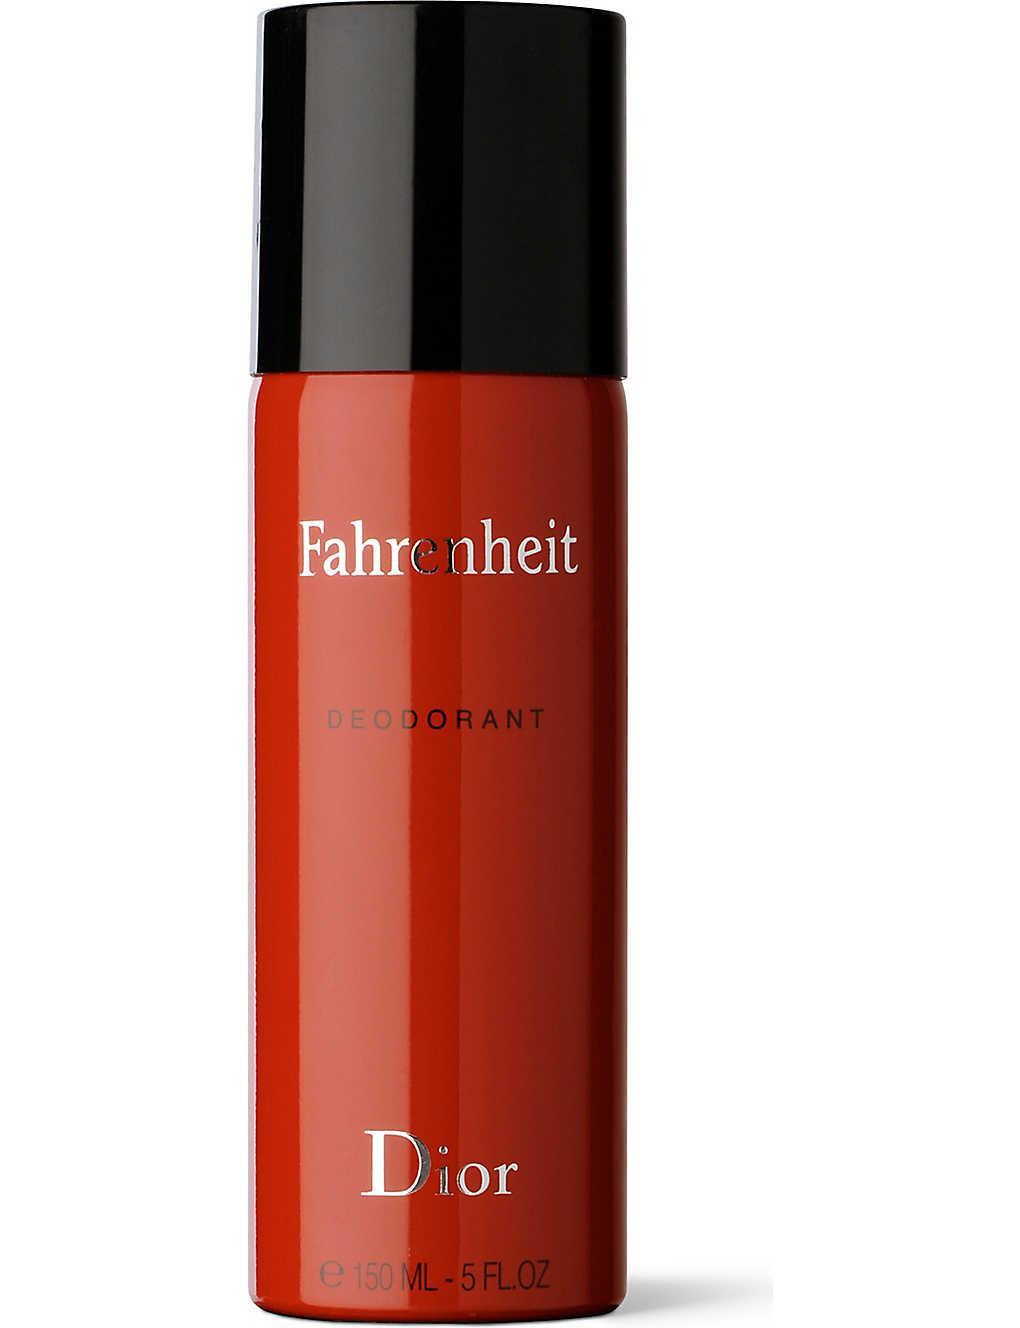 Dior Fahrenheit M Deodorant Spray 150ML